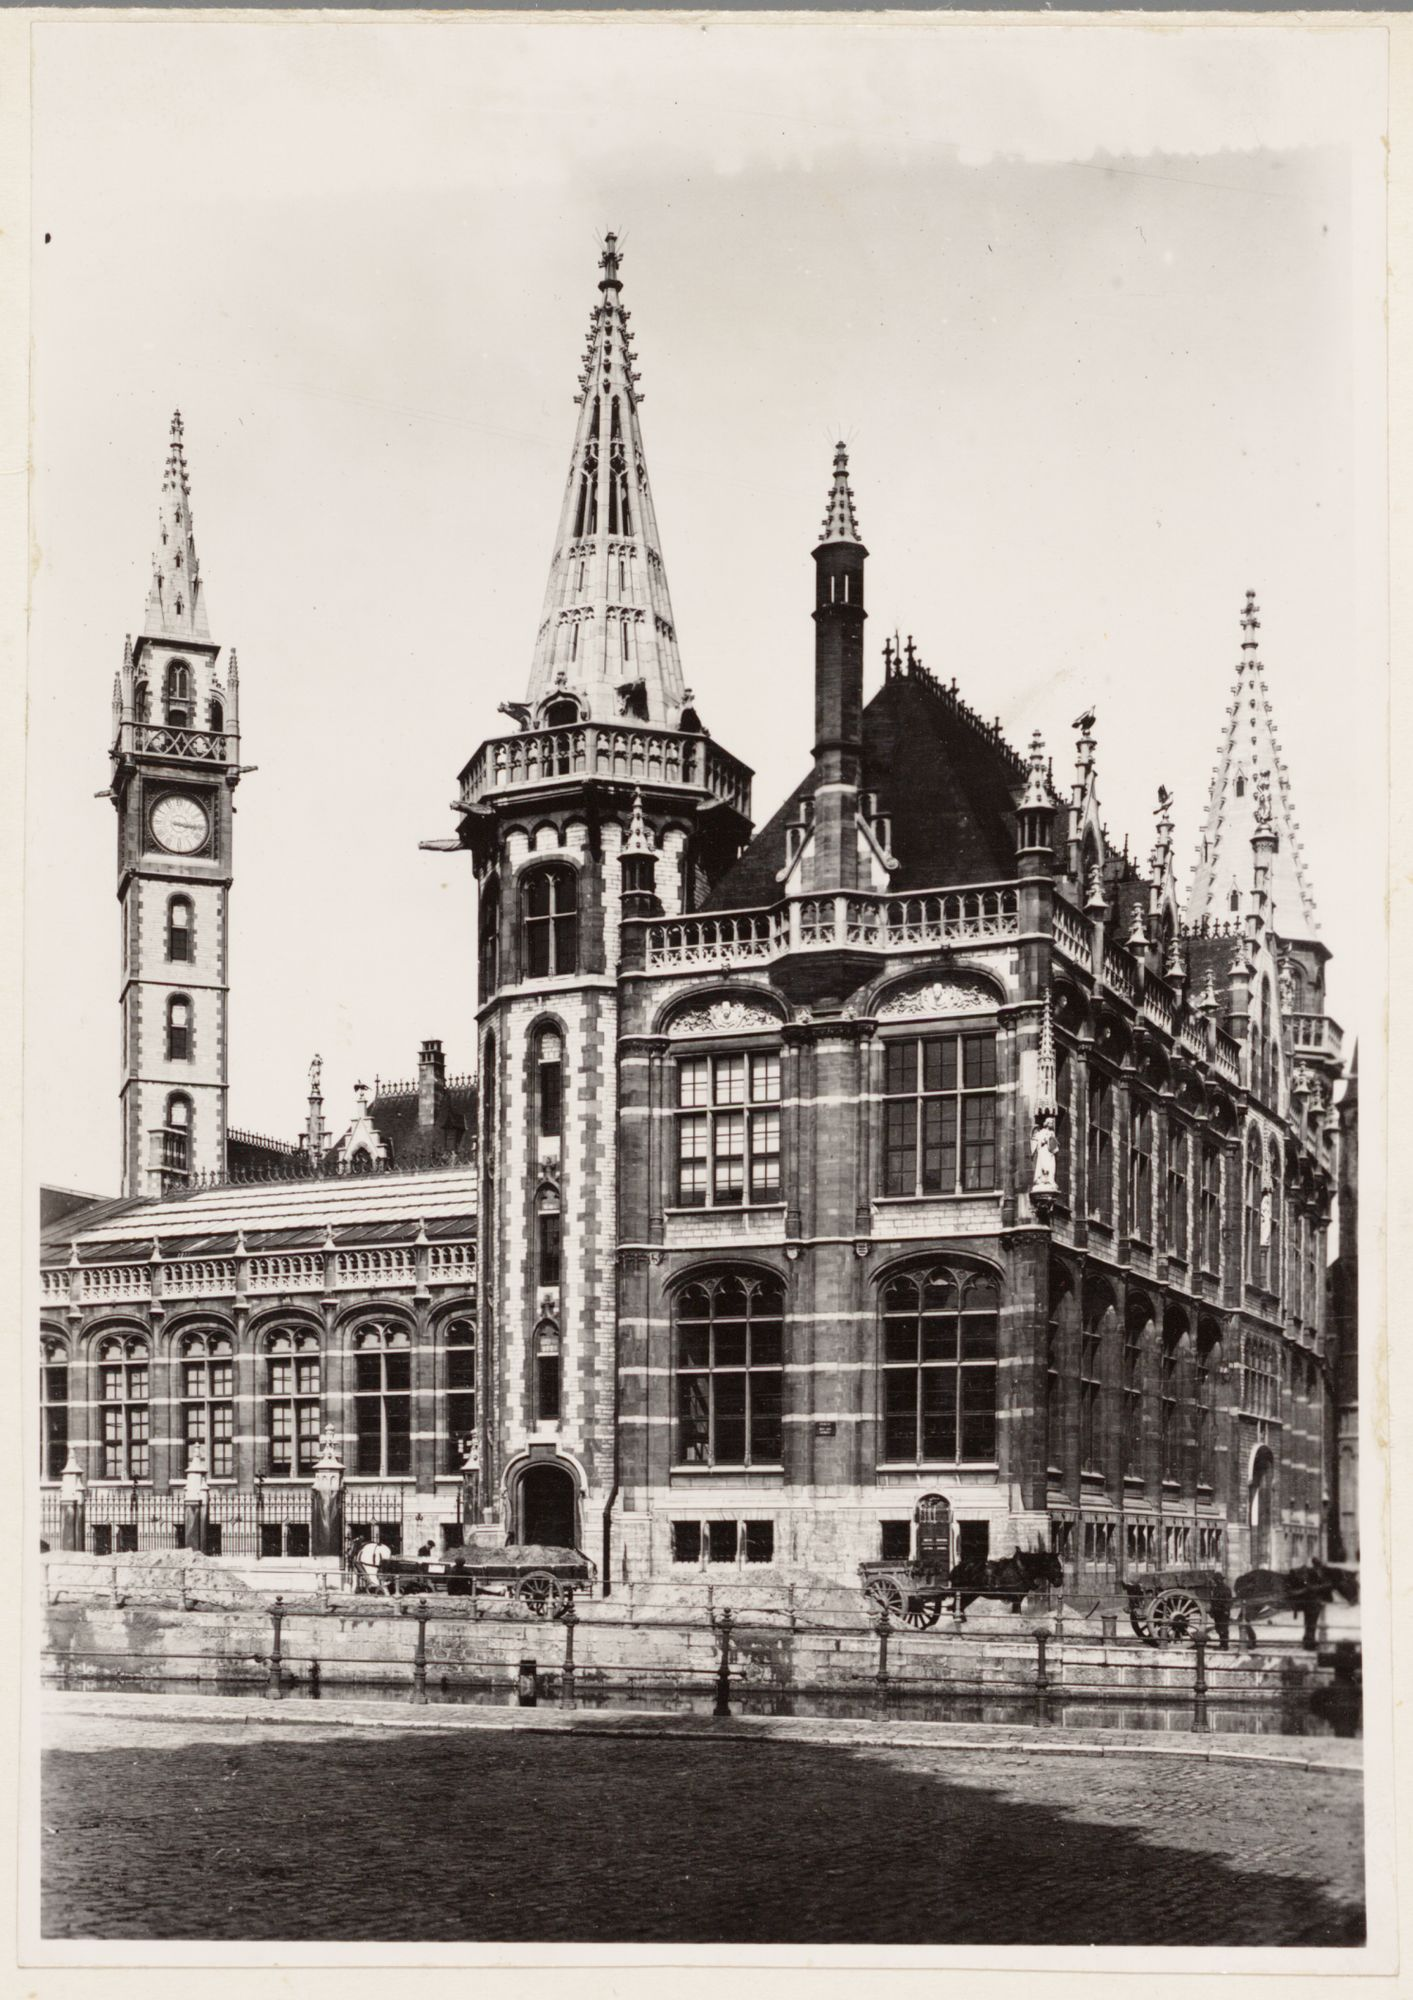 Gent: Achtergevel nieuw postgebouw, Graslei